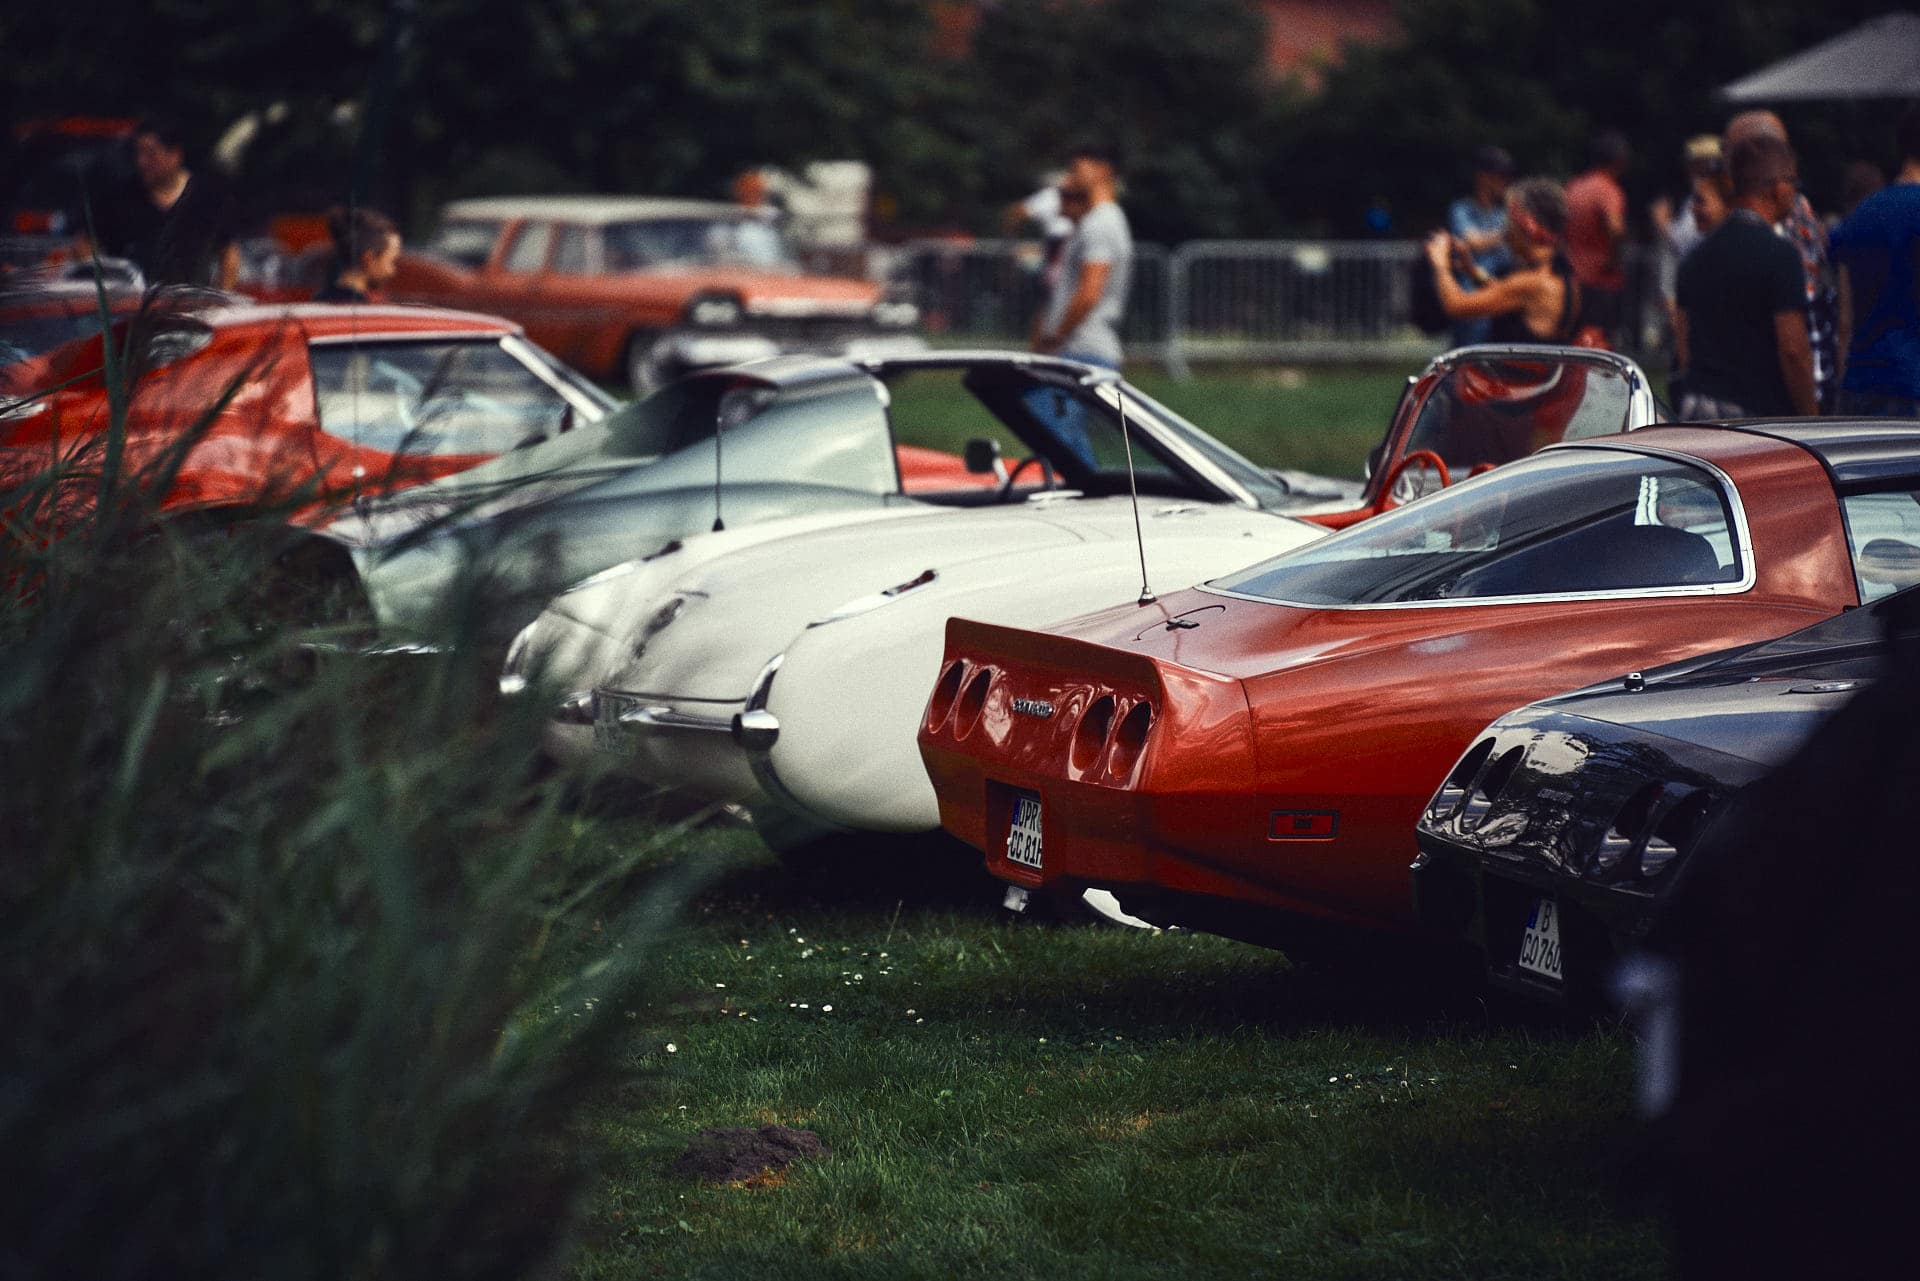 US Car Classics Diedersdorf uscarsgermany kramm us cars classic diedersdorf8